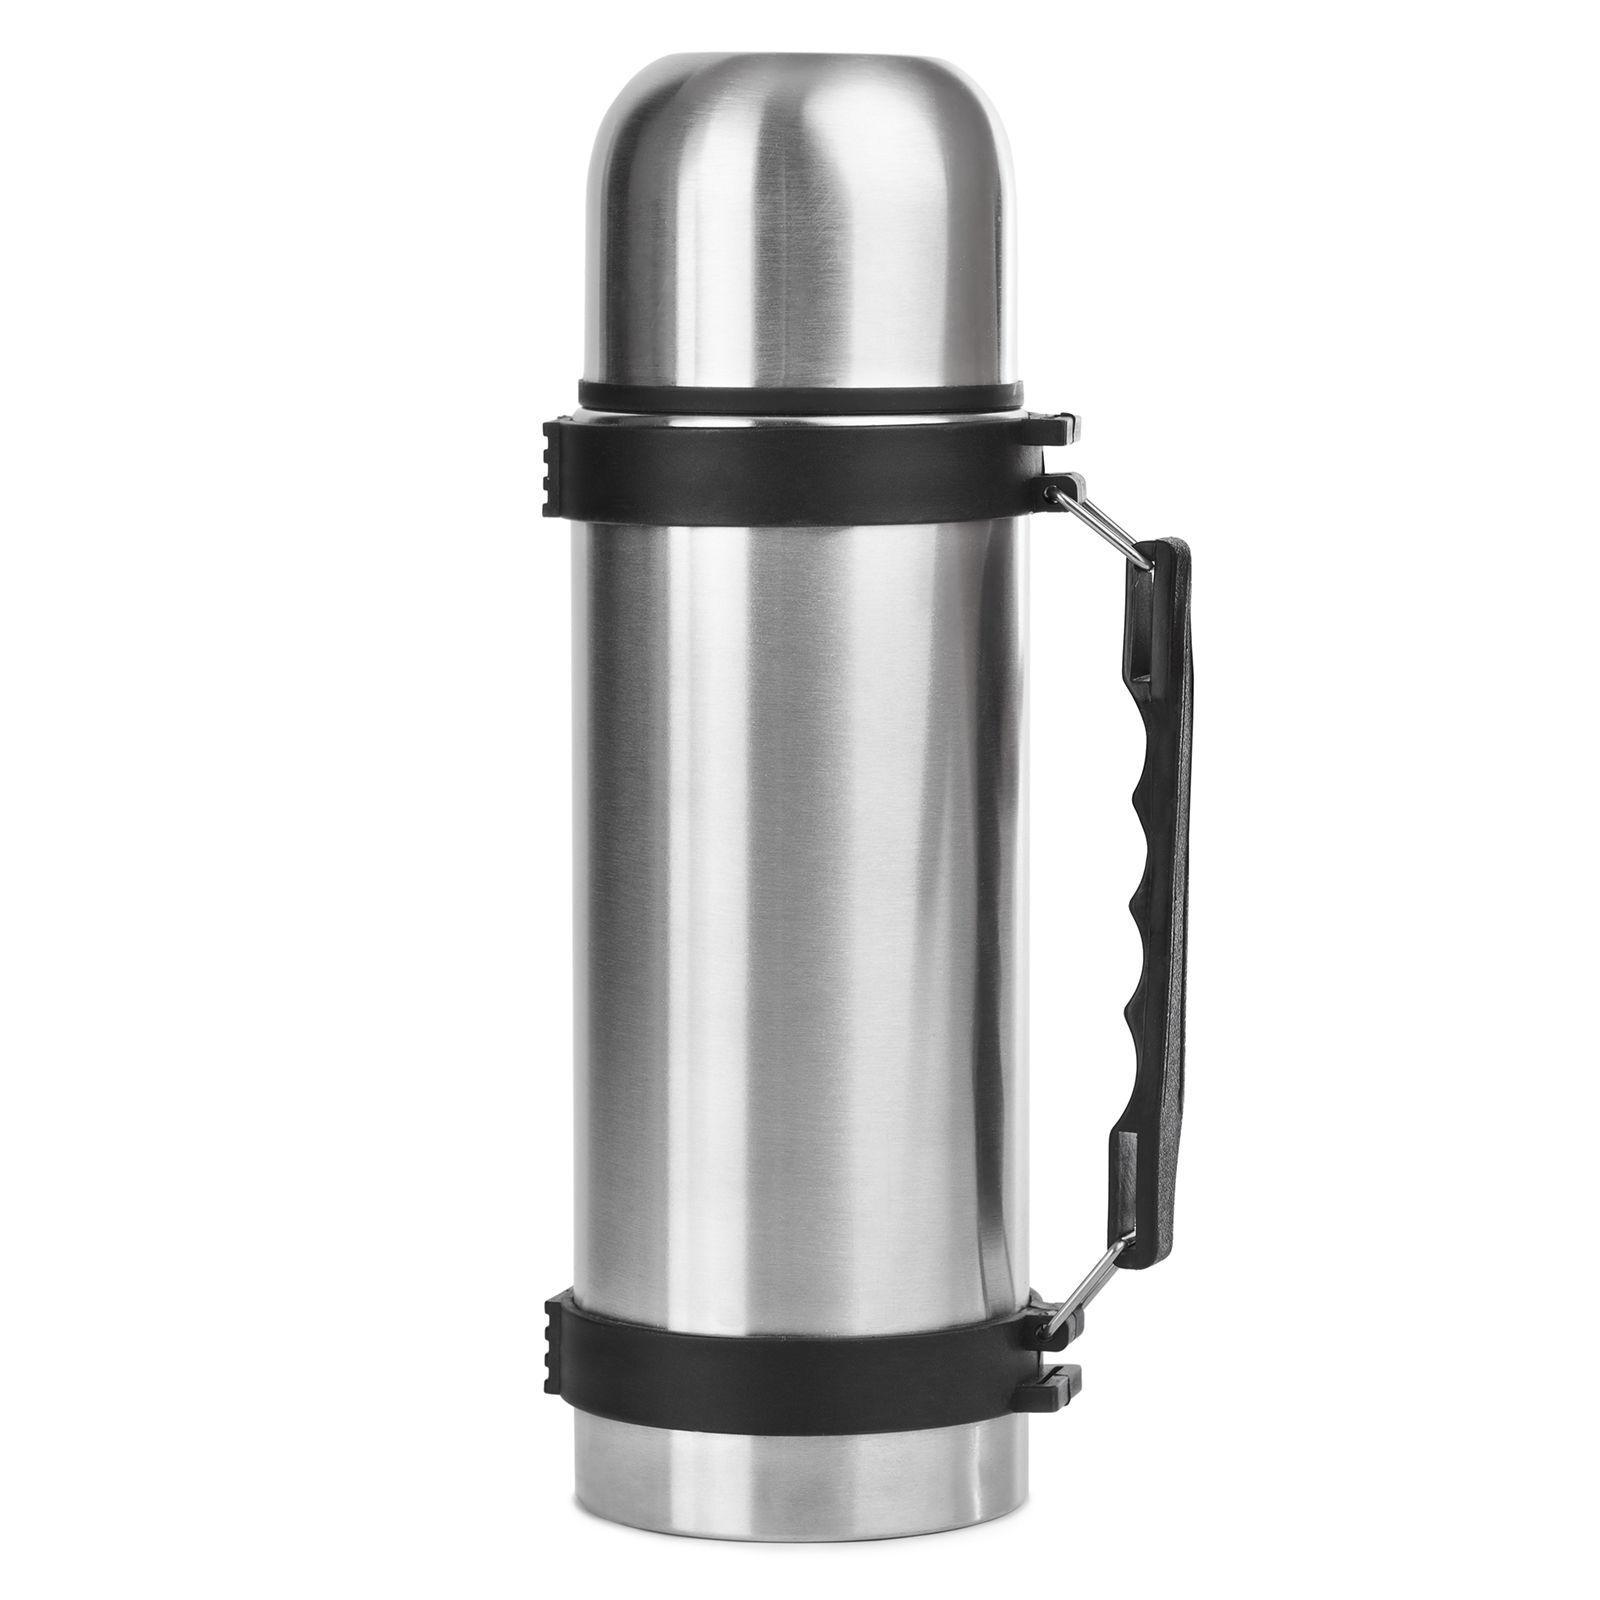 Leifheit IsolierflascheThermoflasche Kaffeekanne Kanne Silber Edelstahl 0,75l